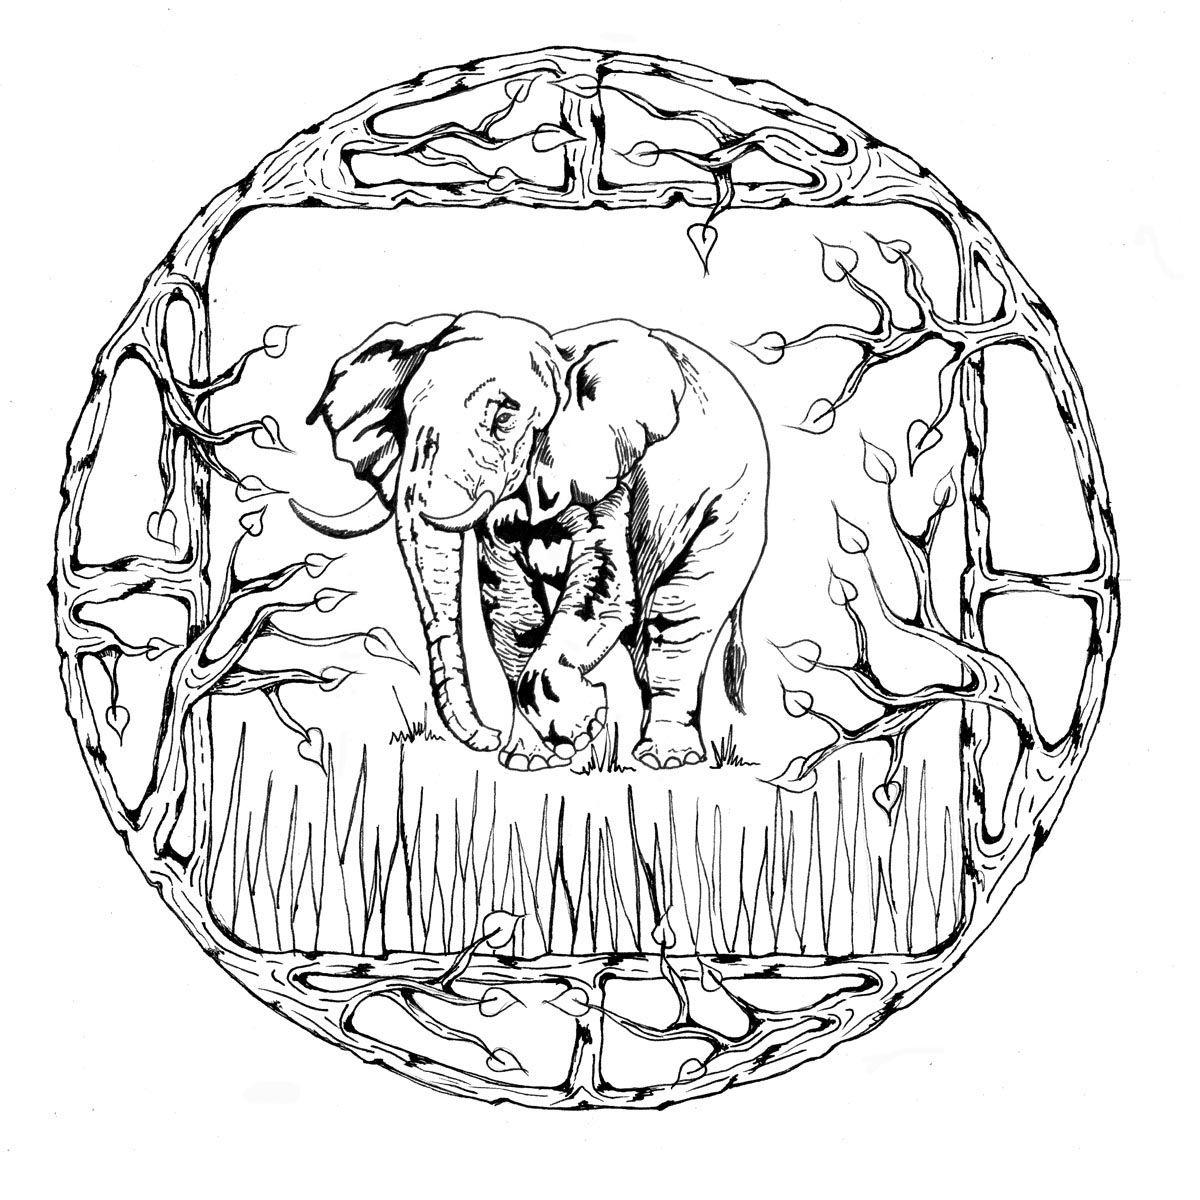 Free Animal Mandalas Coloring Pages Download Free Clip Art Free Clip Art On Clipart Library